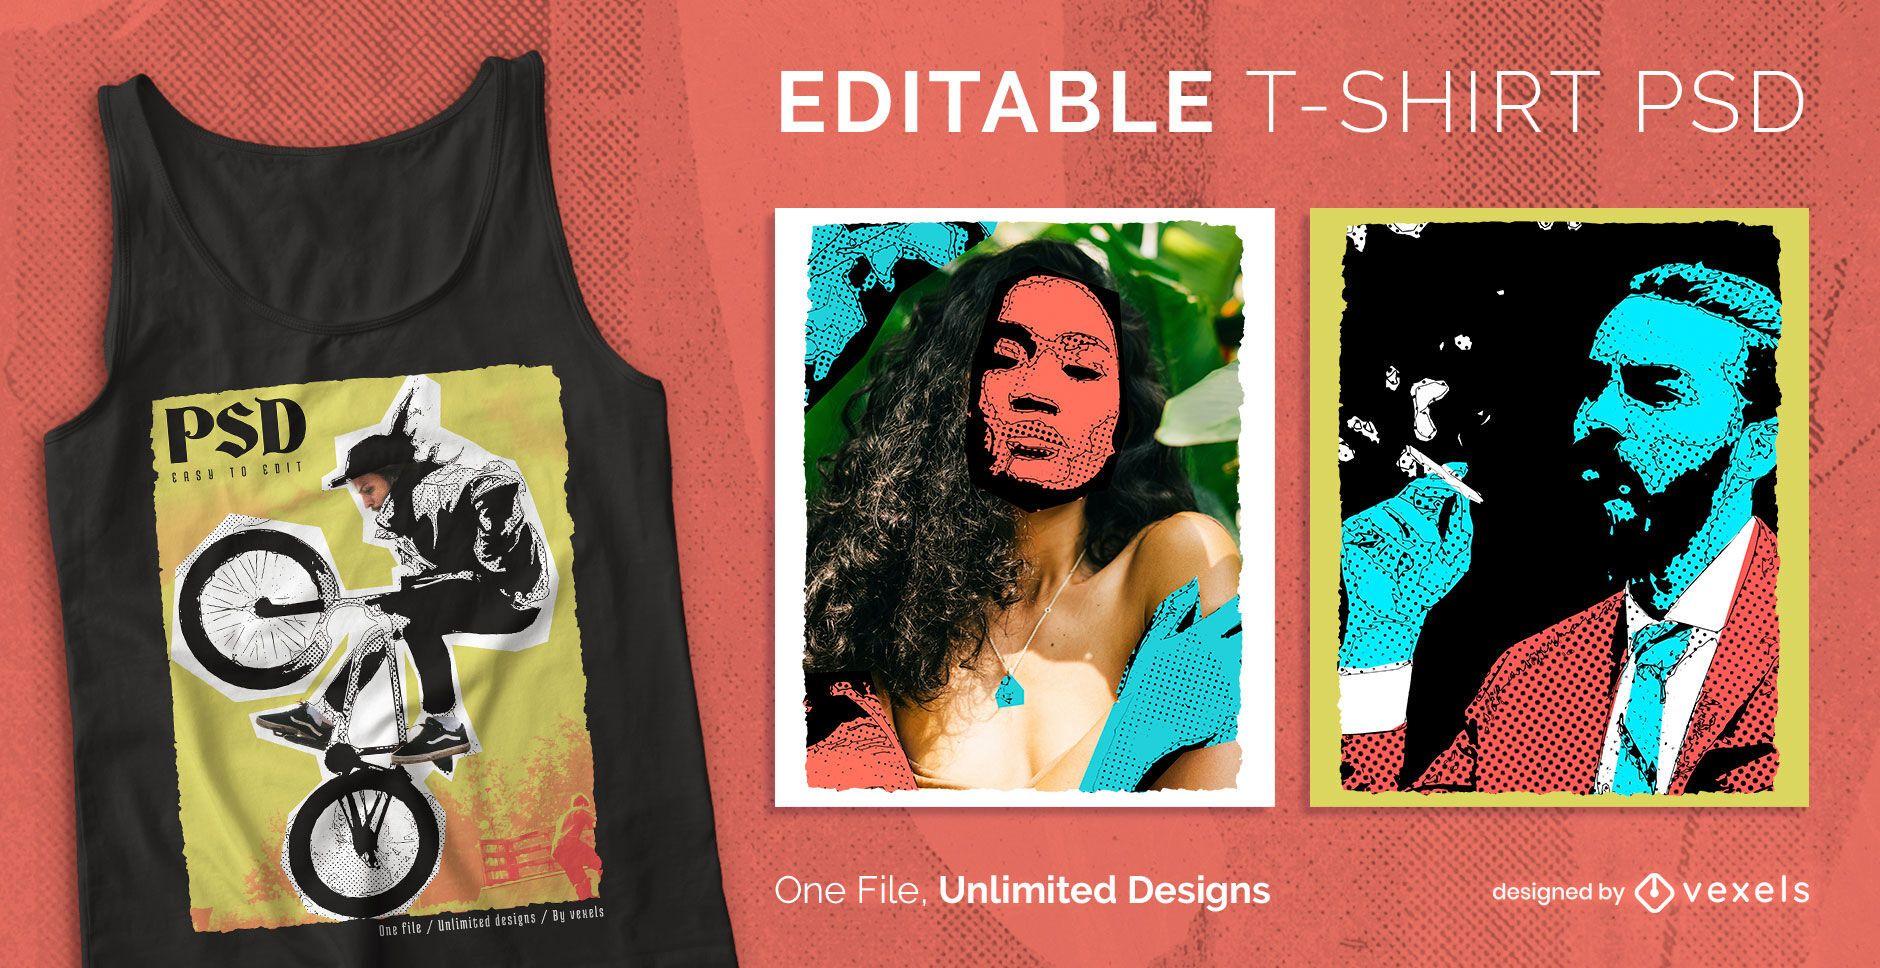 Pop art photography scalable t-shirt psd